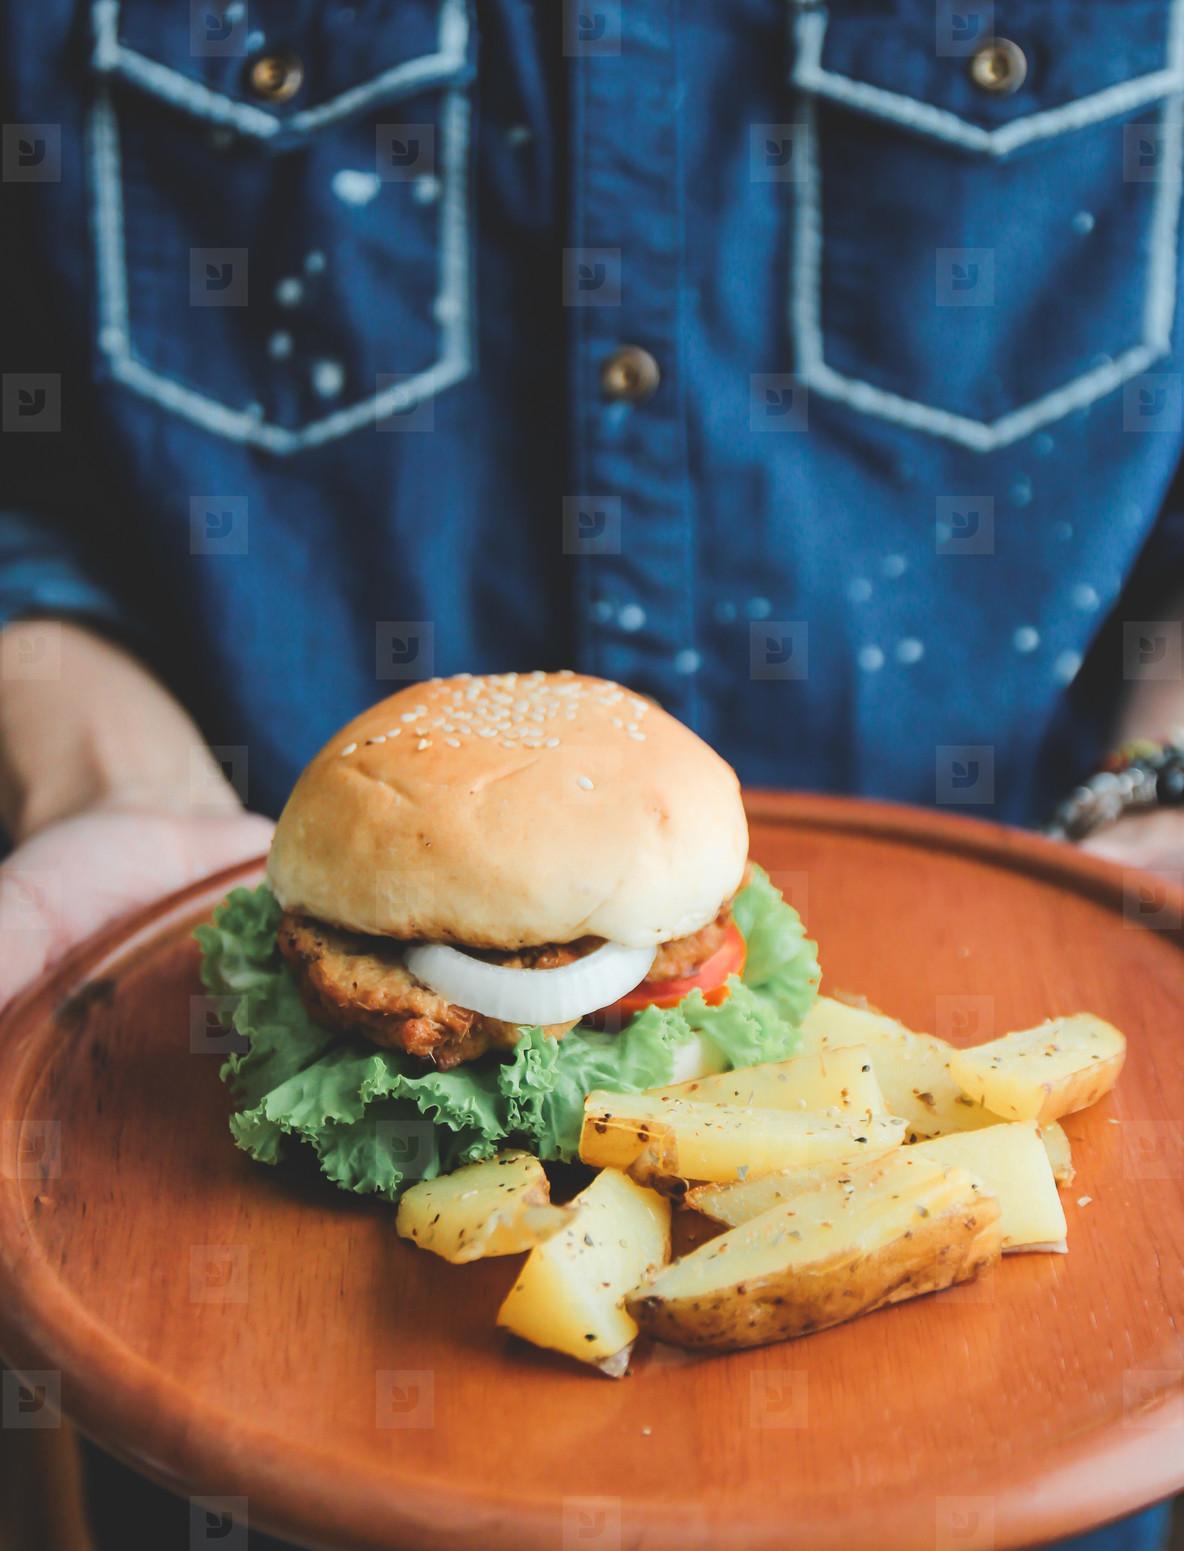 Man holding tasty burger